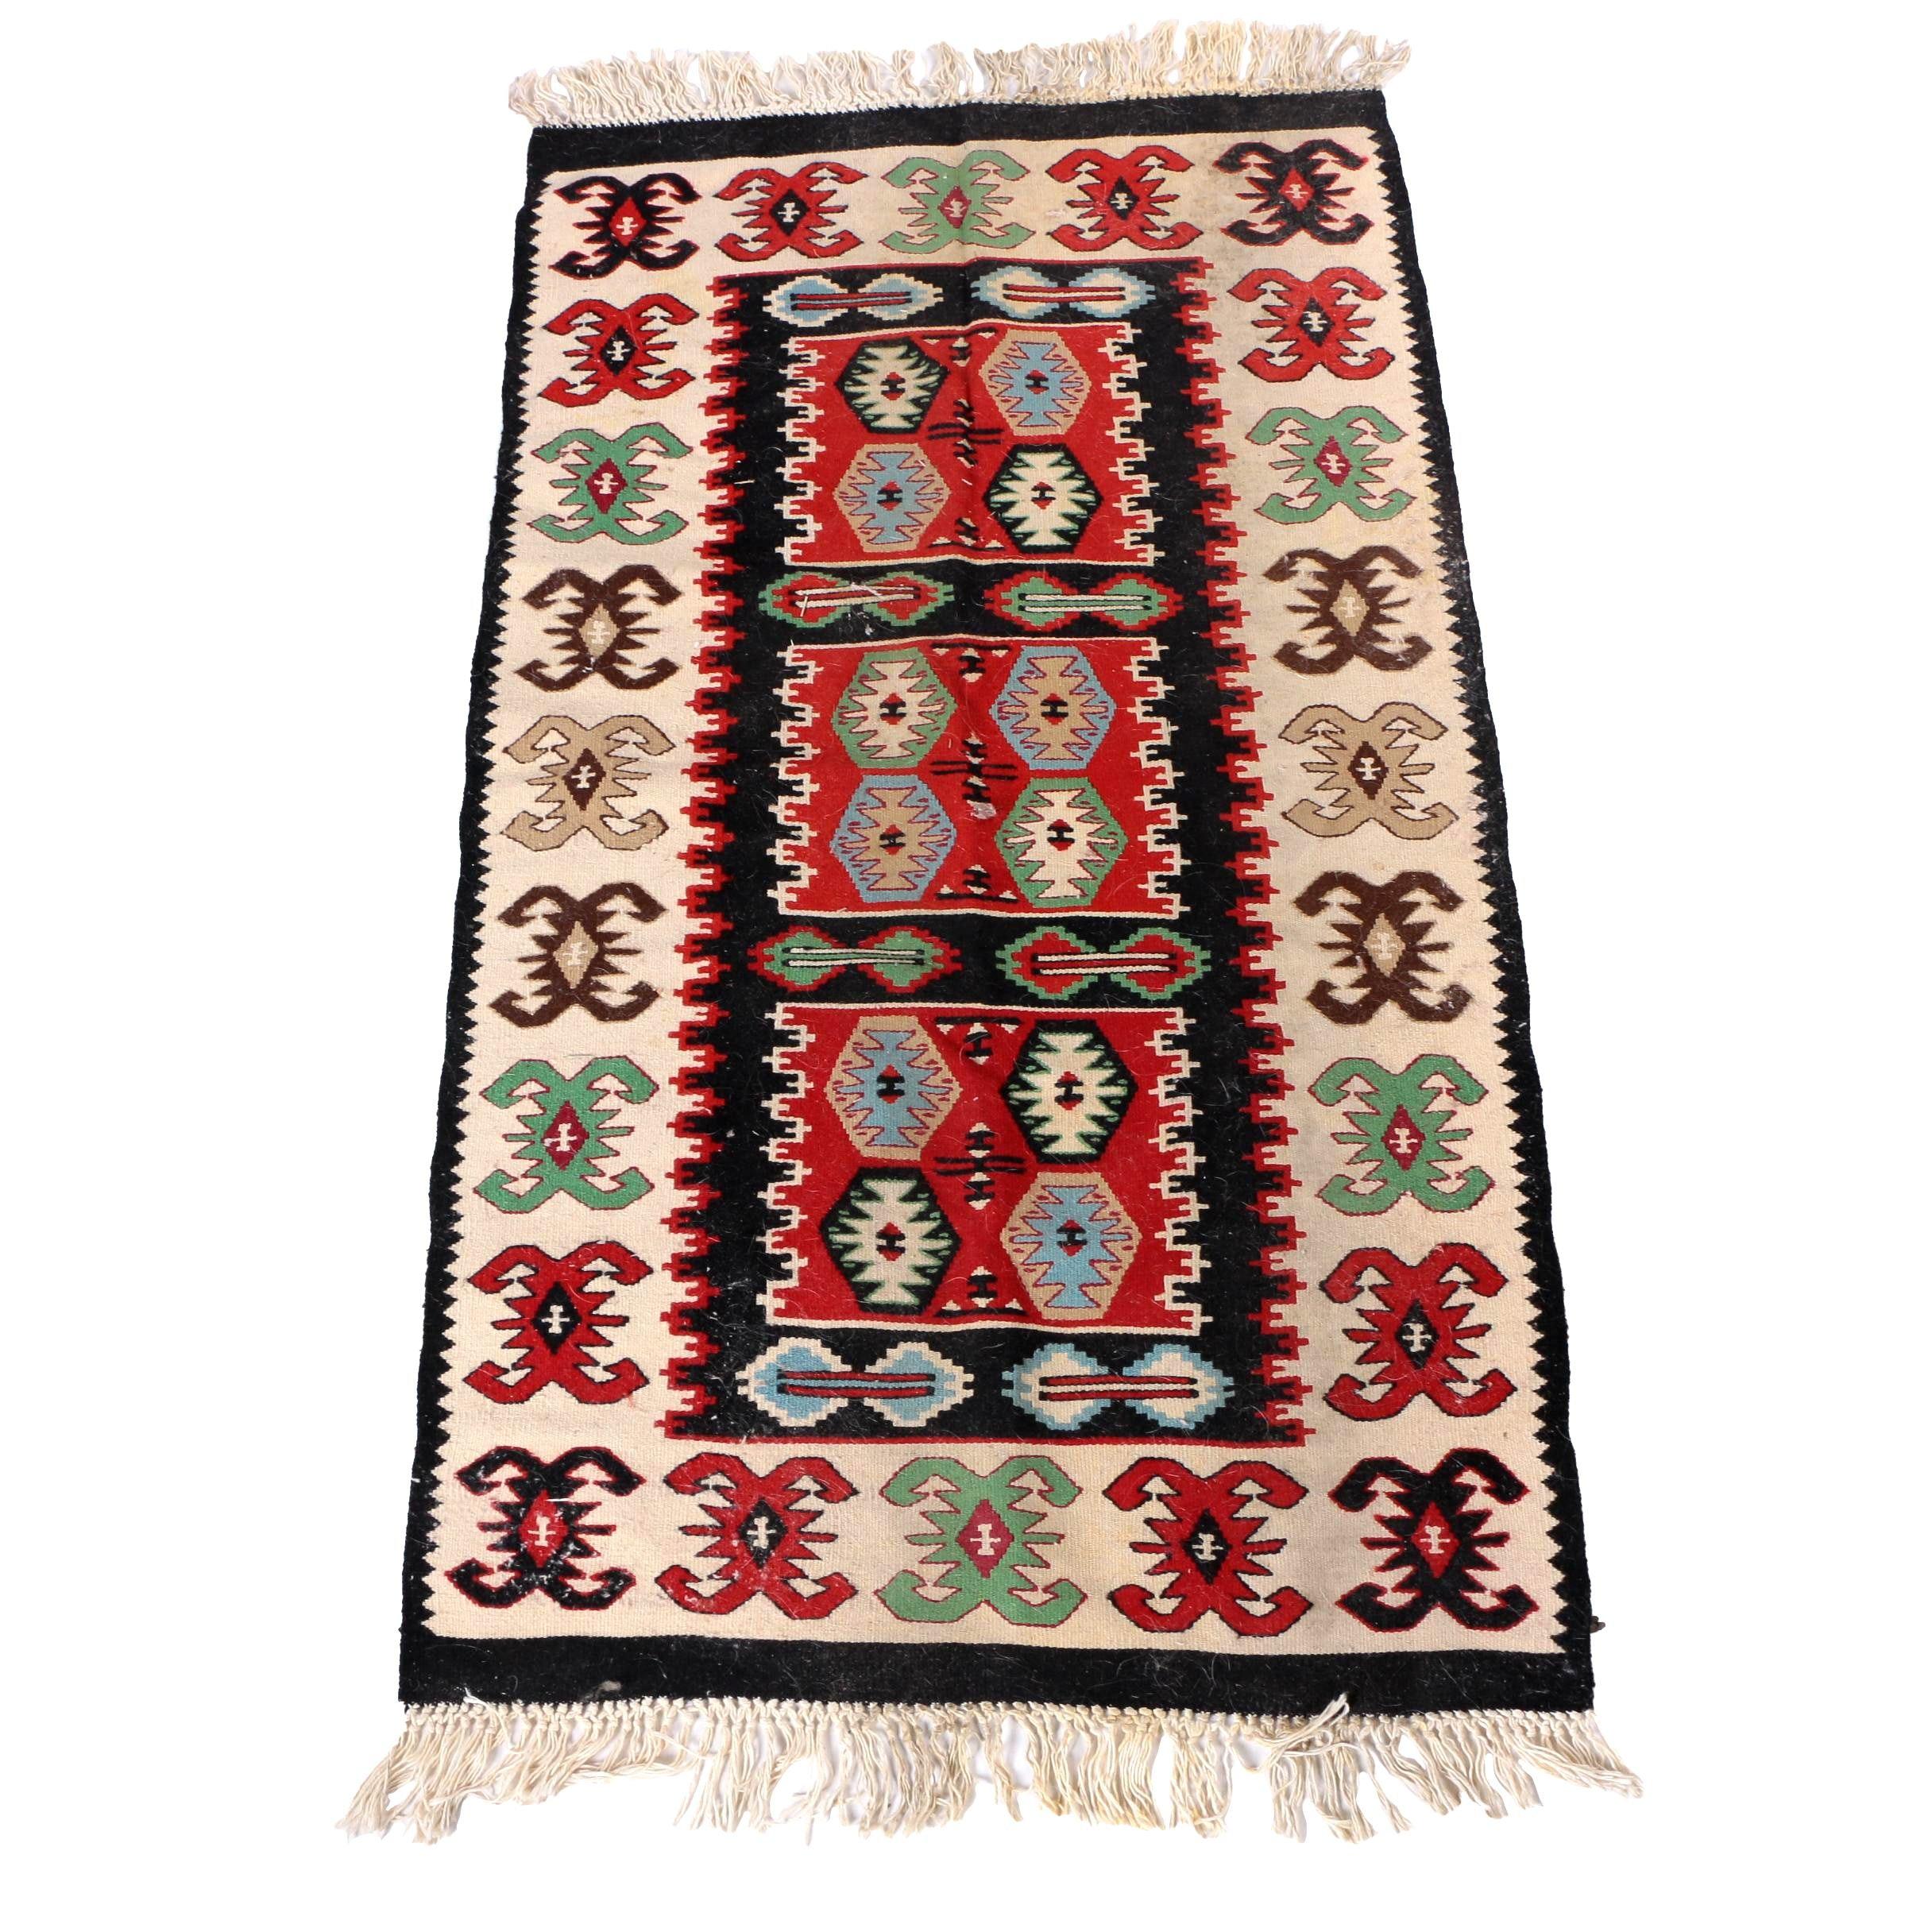 Handwoven Anatolian Kilim Wool Accent Rug